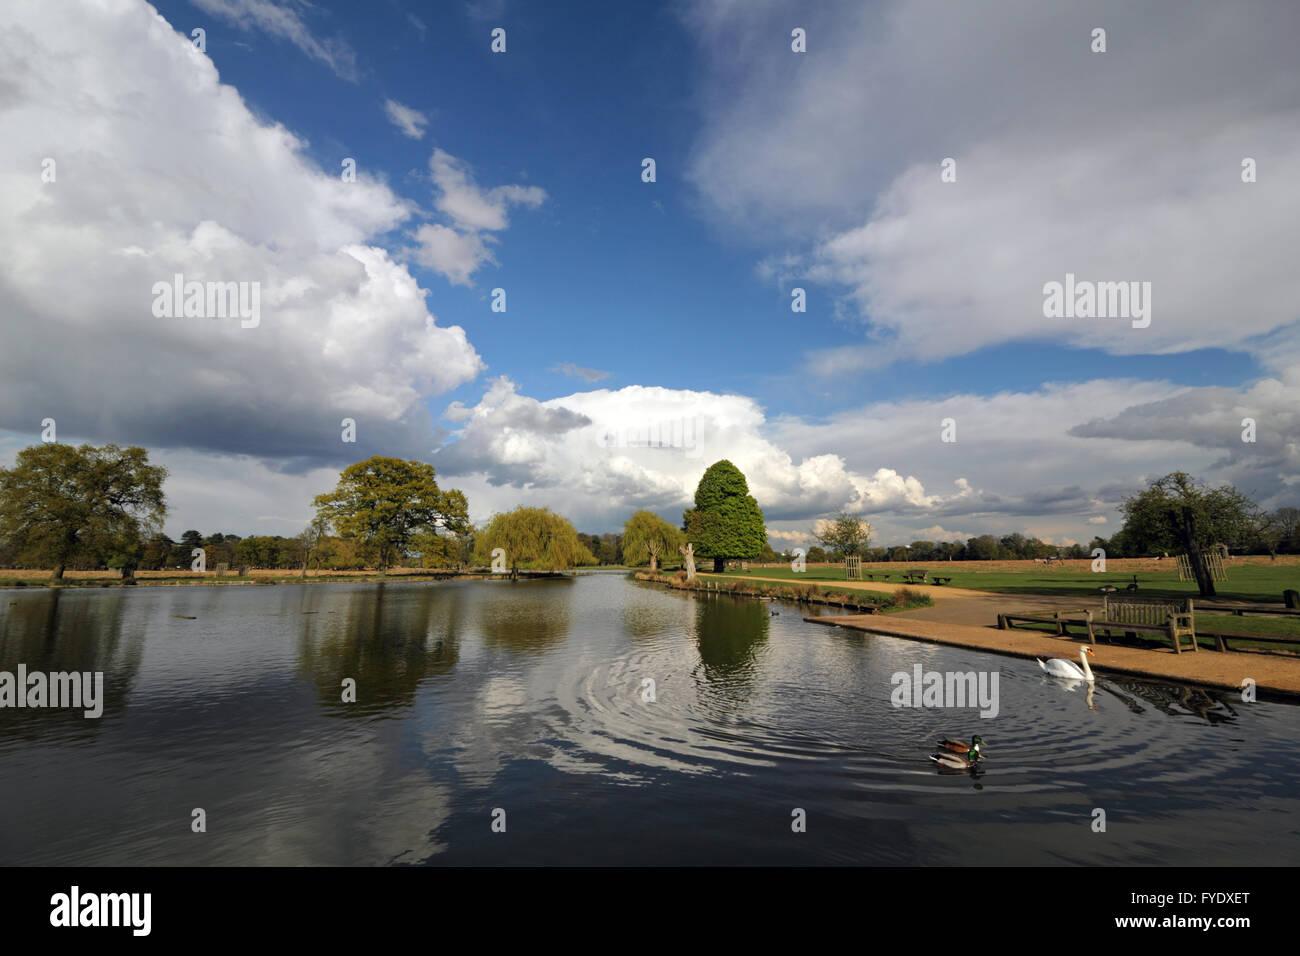 Bushy Park, London, UK. 26th April 2016. UK Weather: Huge cumulonimbus clouds pass over the Heron Pond in Bushy - Stock Image